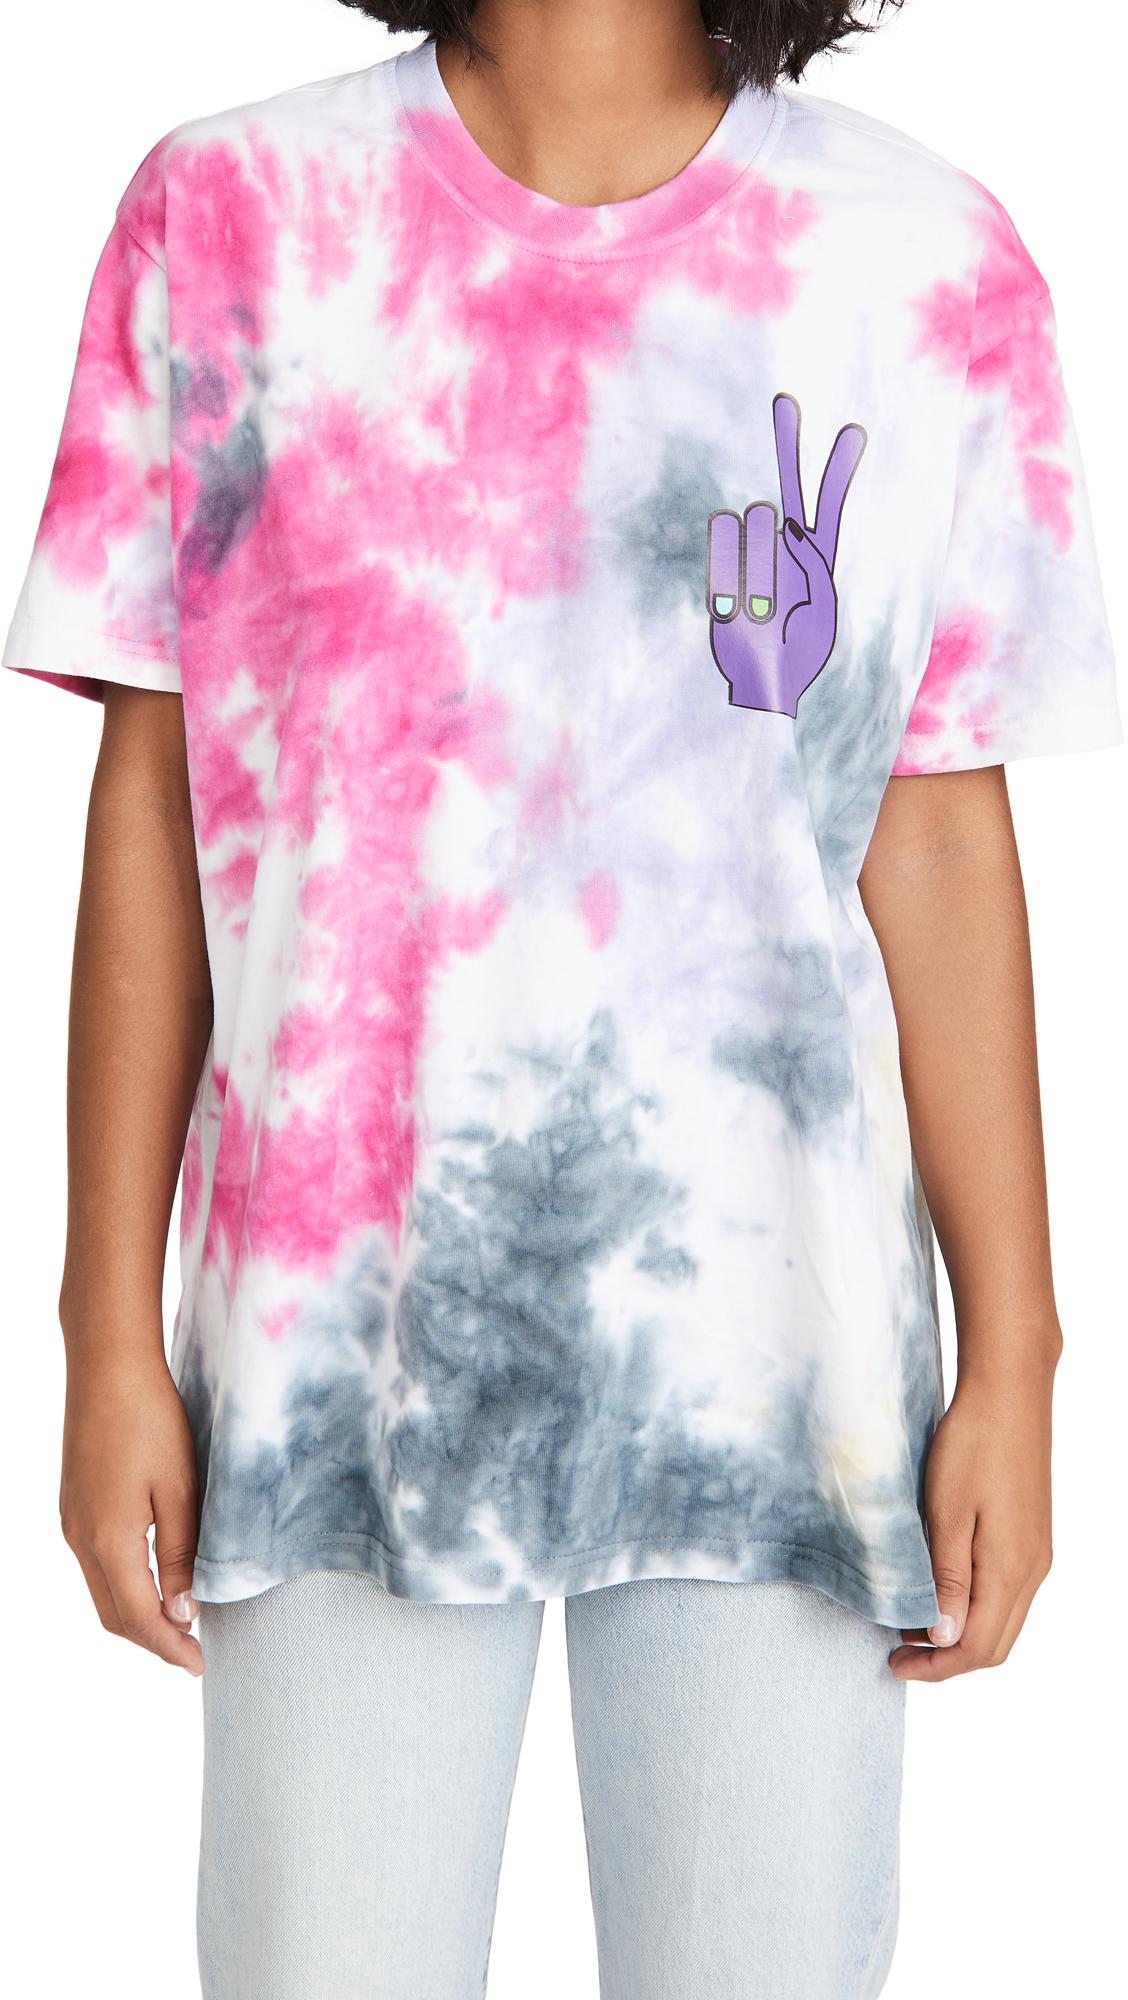 Natasha Zinko Tie Dye Shirt